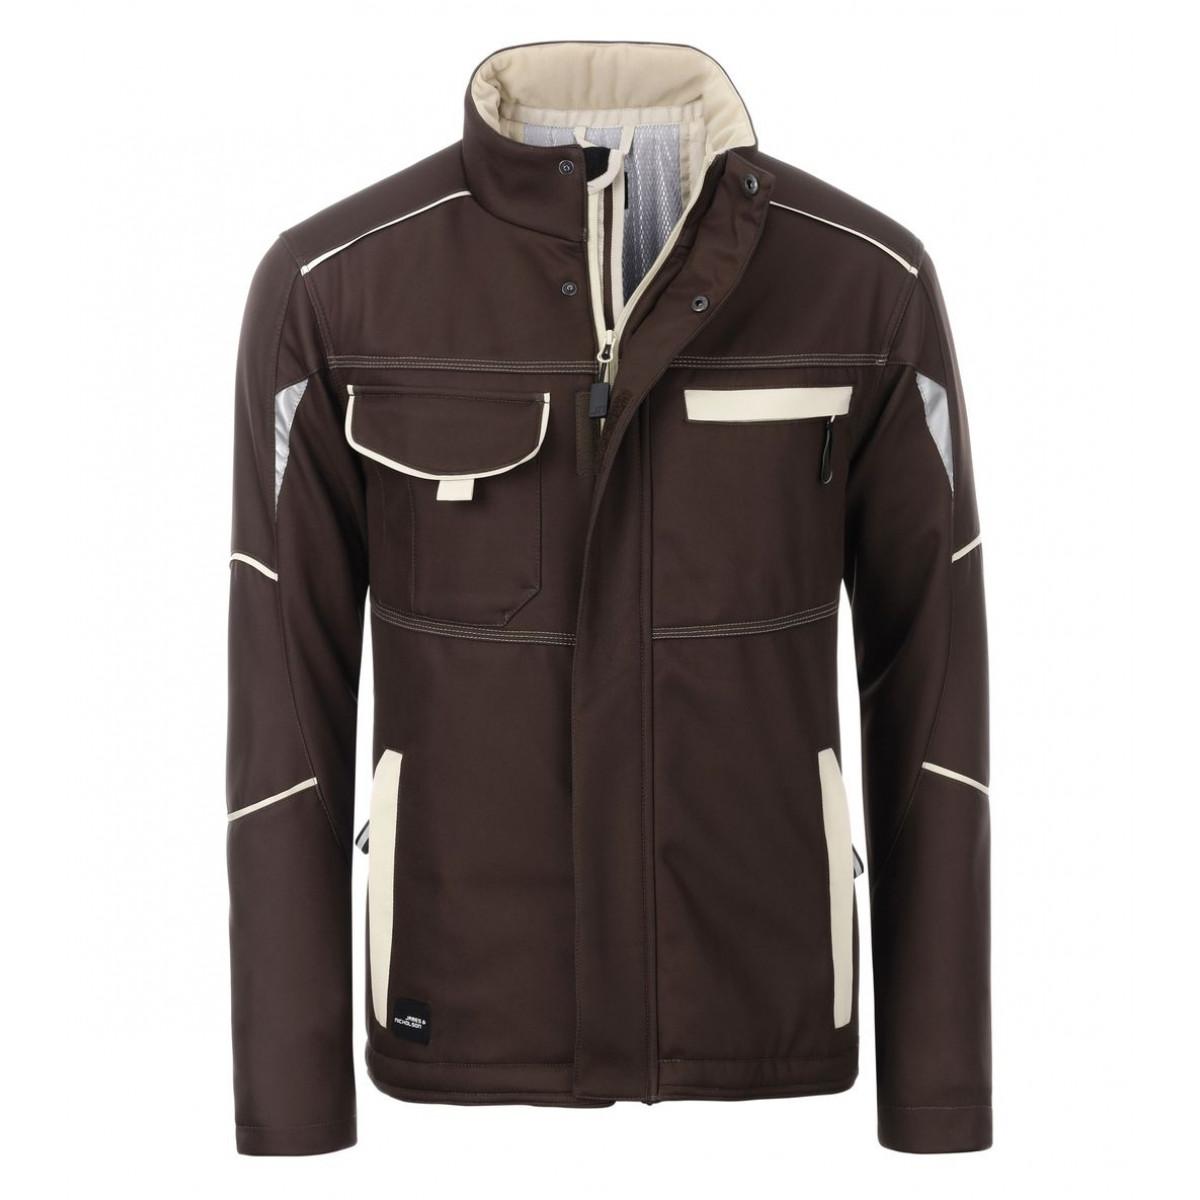 Куртка мужская JN853 Workwear Softshell Padded Jacket-Level 2 - Коричневый/Бежевый